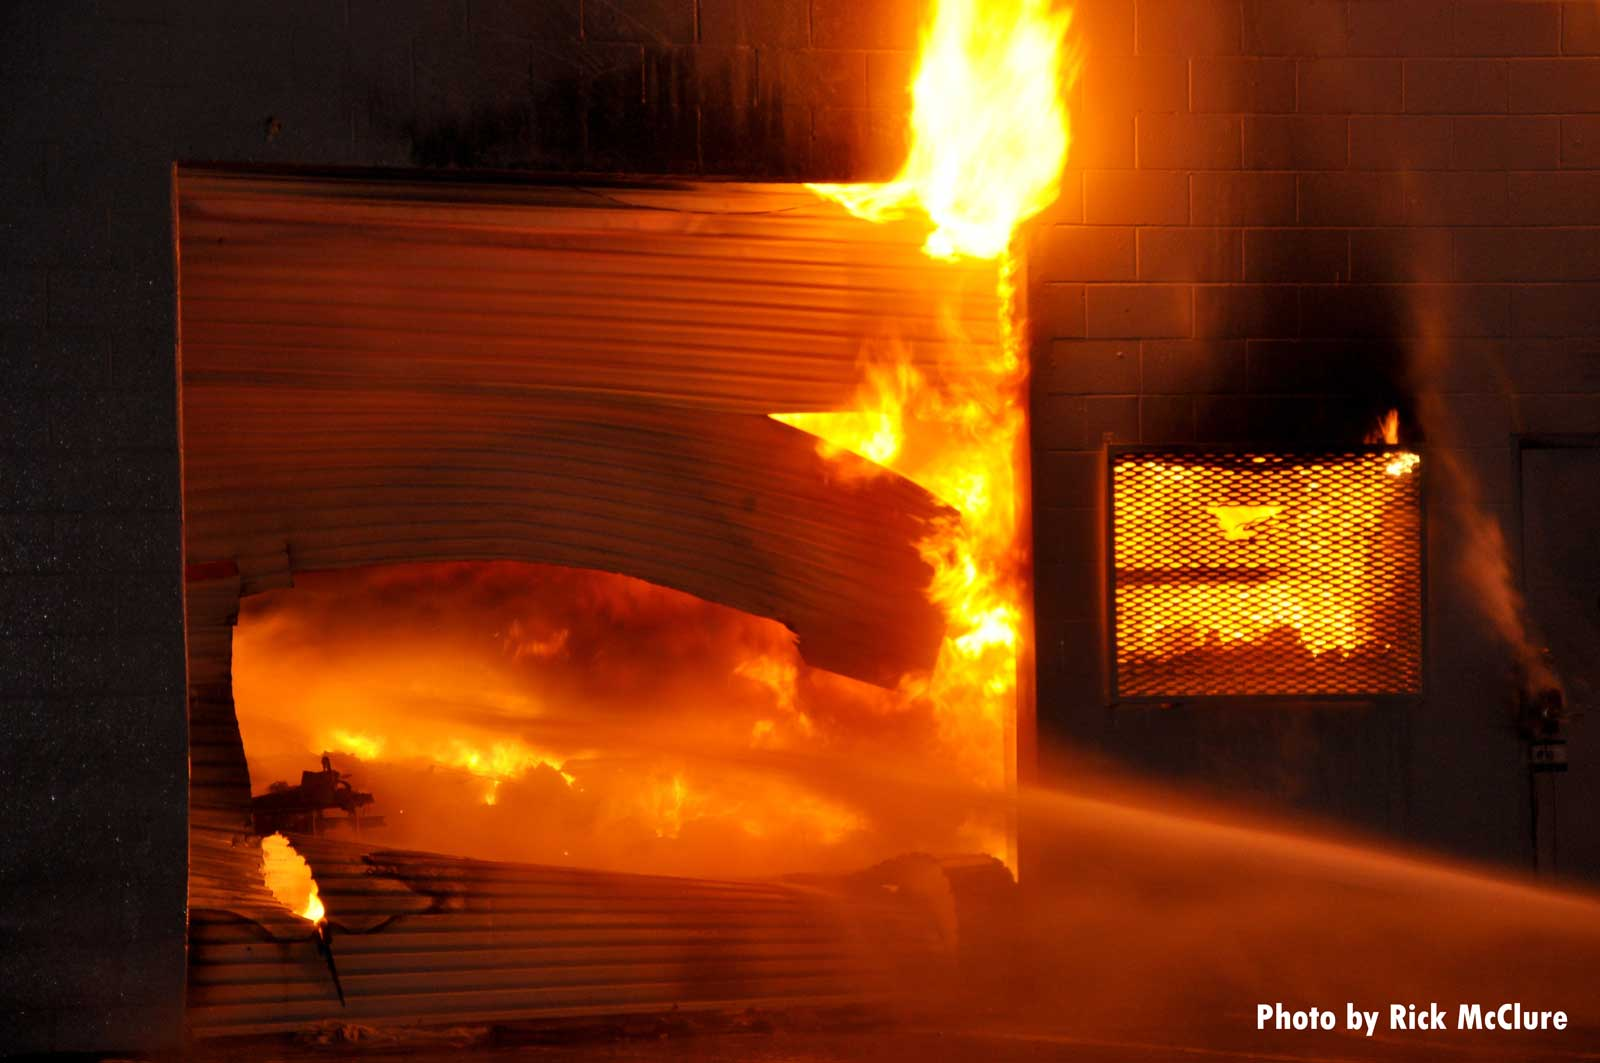 Flames rip through the building